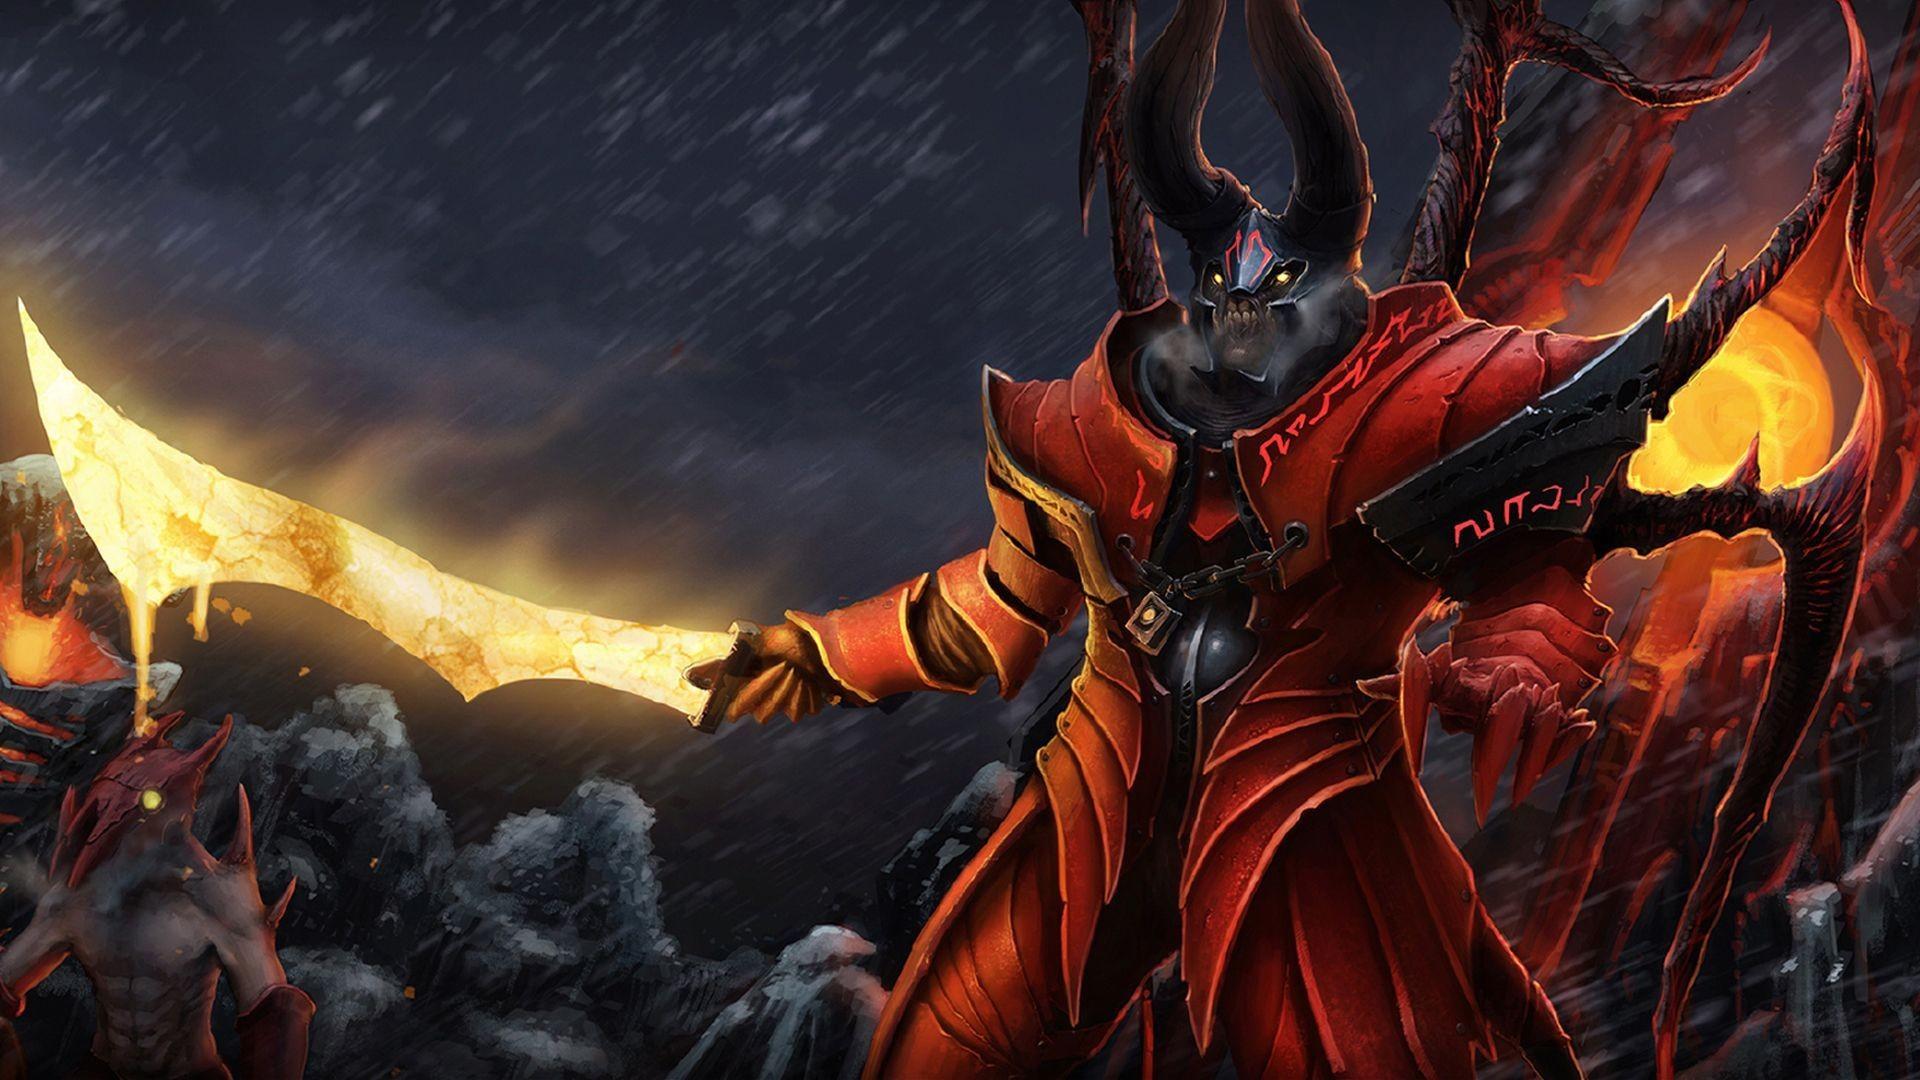 Lucifer: The Doom Bringer Wallpaper